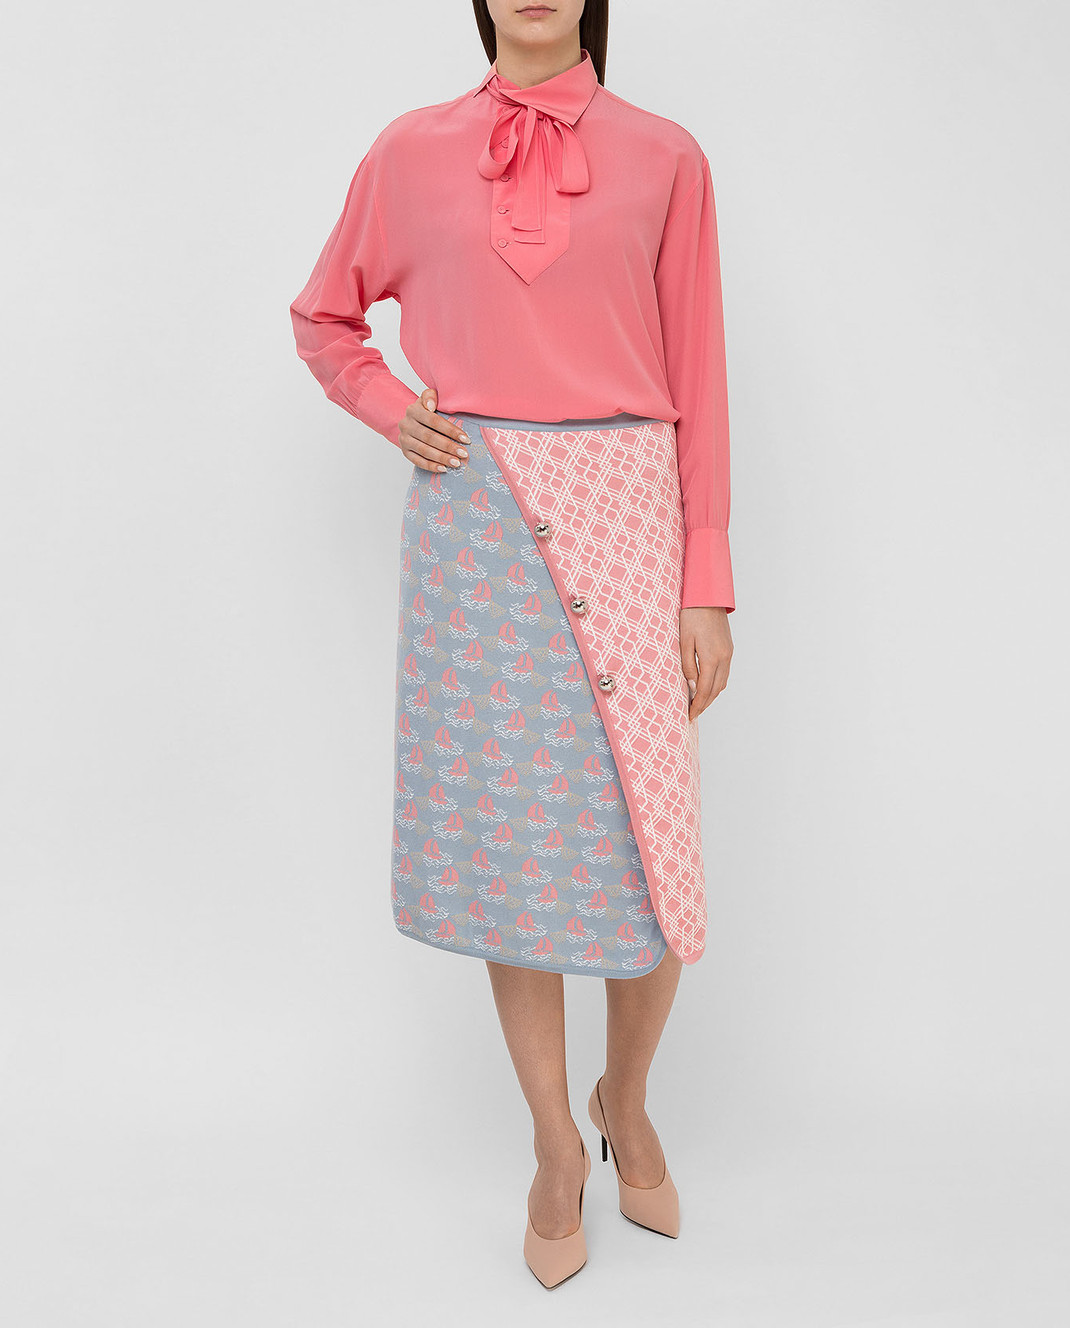 Valentino Коралловая блуза из шелка MB0AB08F21B изображение 2